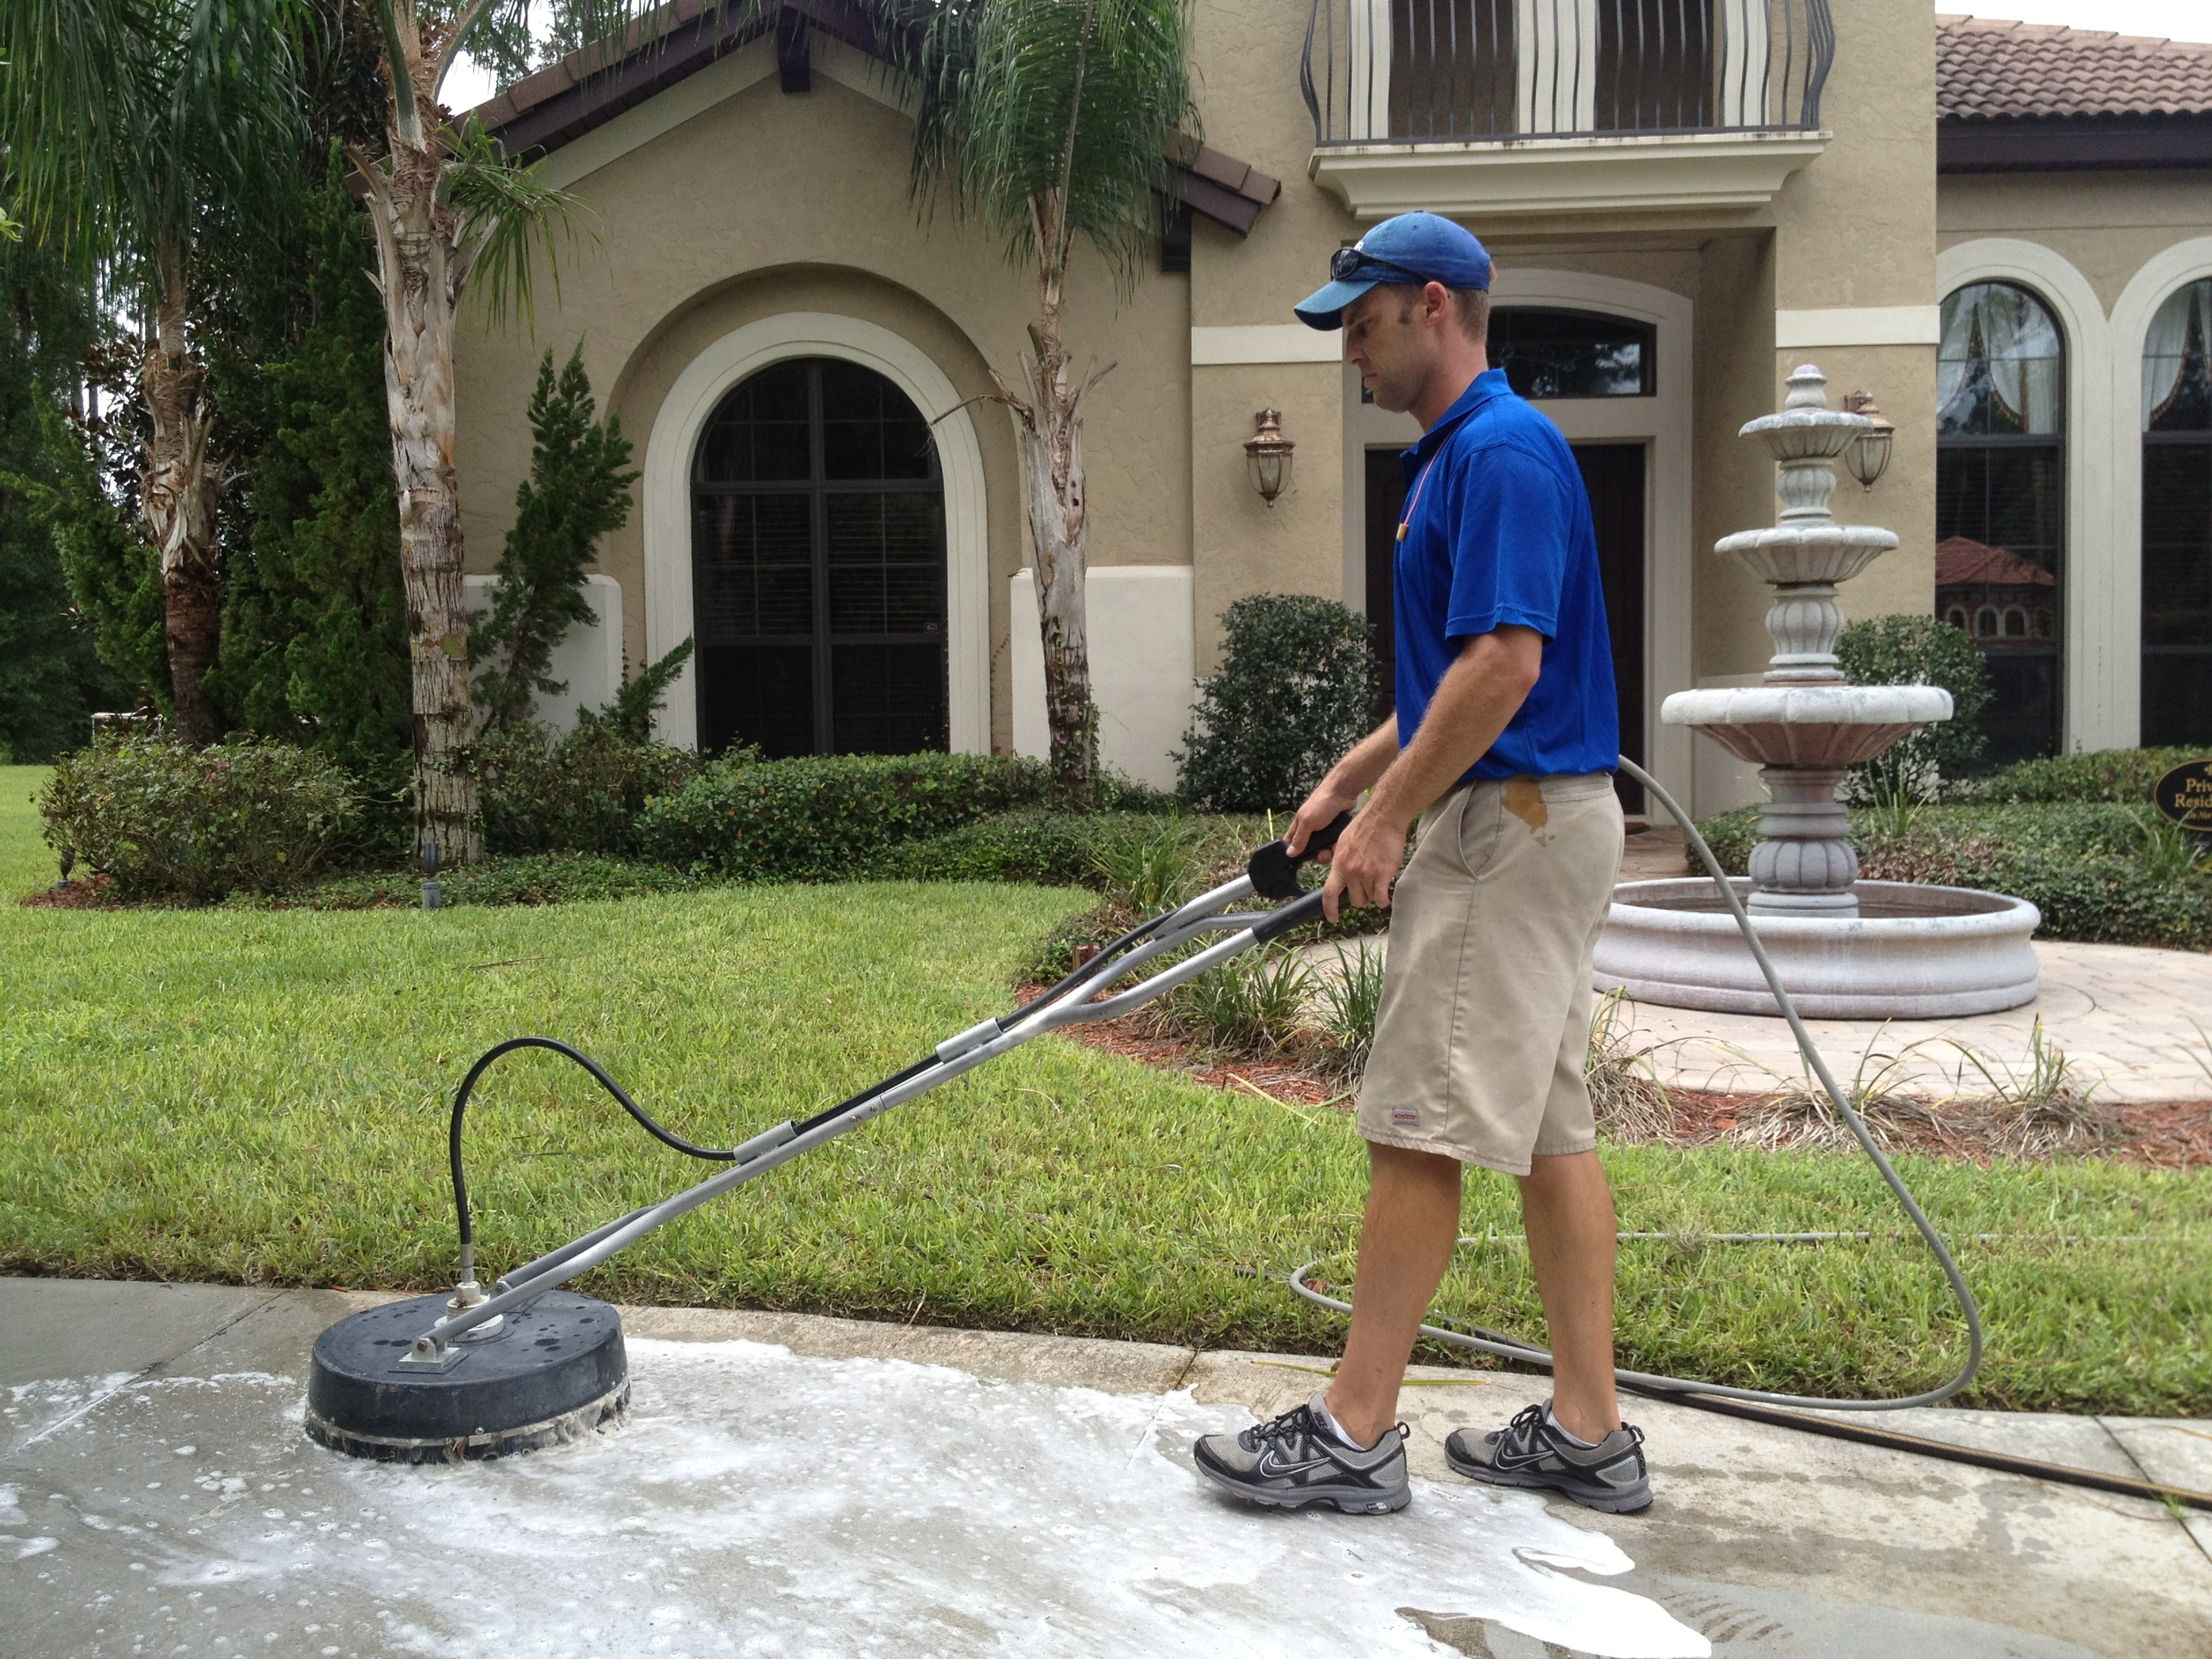 Pressure washing your driveway